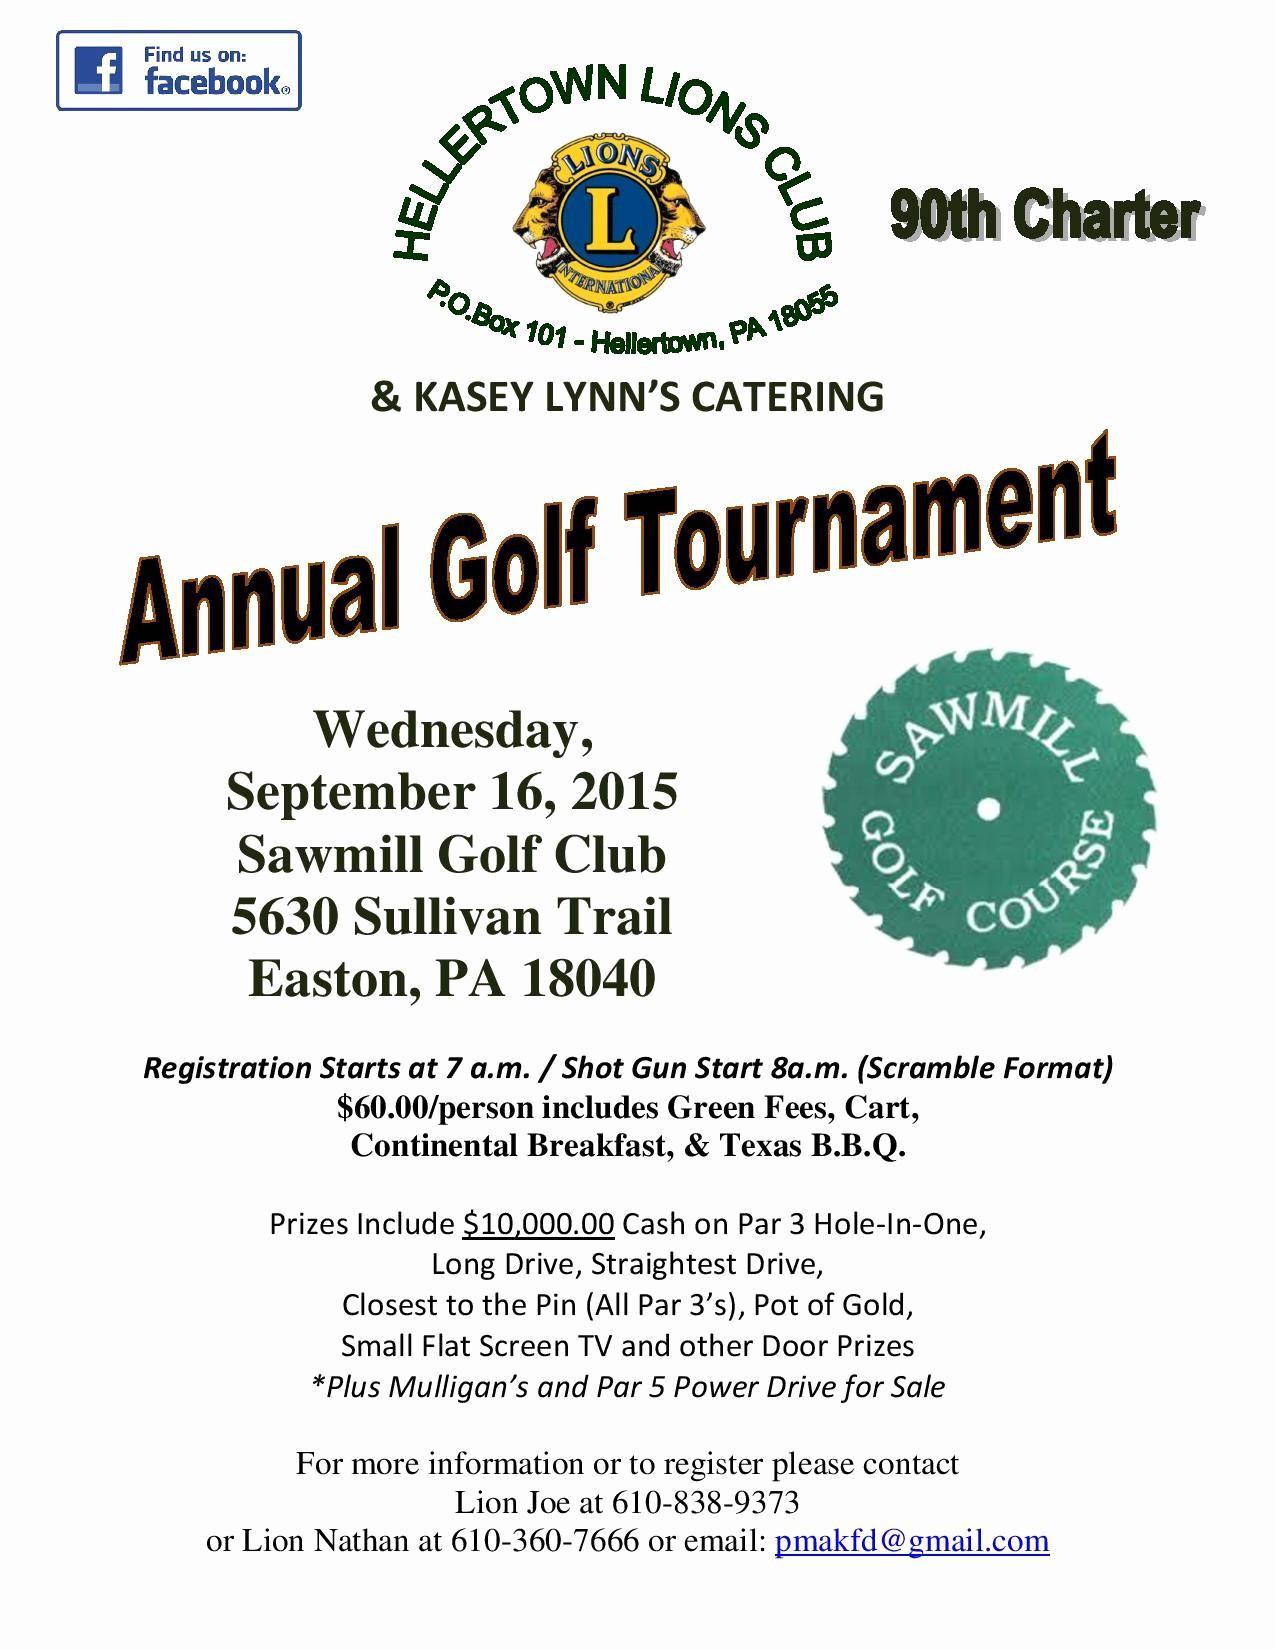 Golf tournament Flyer Template Word Fresh Hellertown Lions Club Annual Golf tournament